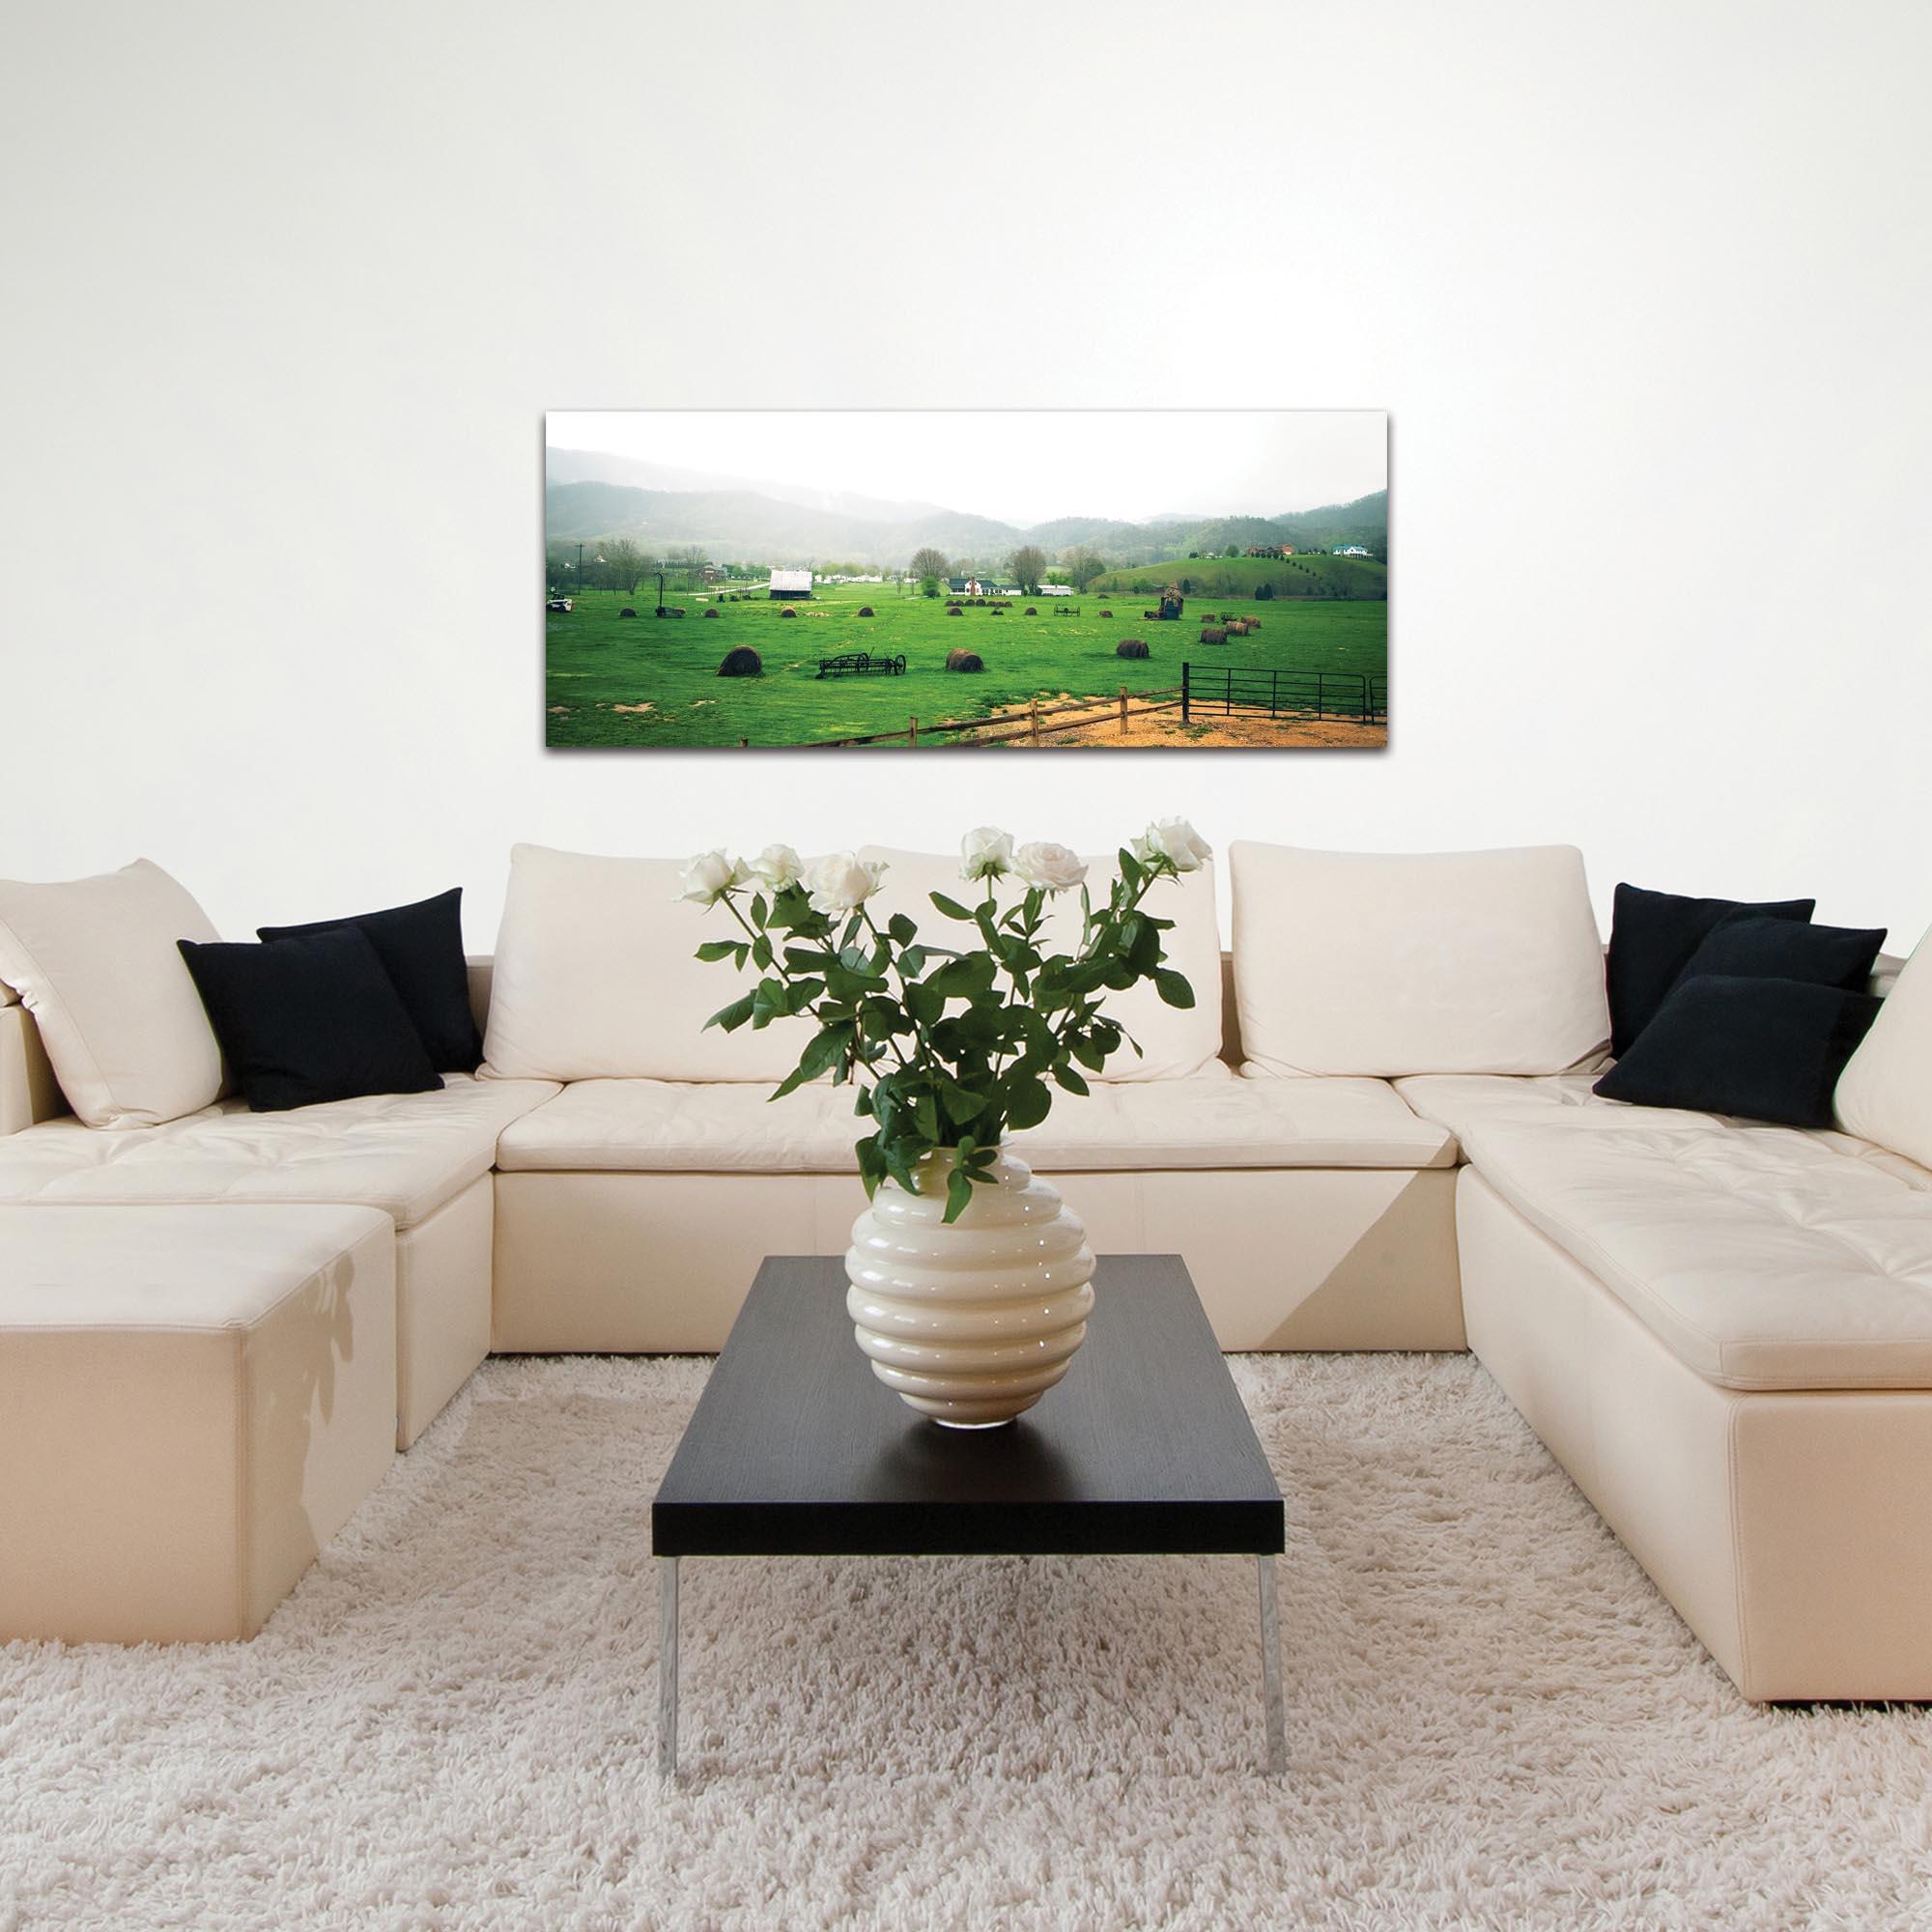 Western Wall Art 'Farming Town' - Farm Landscape Decor on Metal or Plexiglass - Lifestyle View